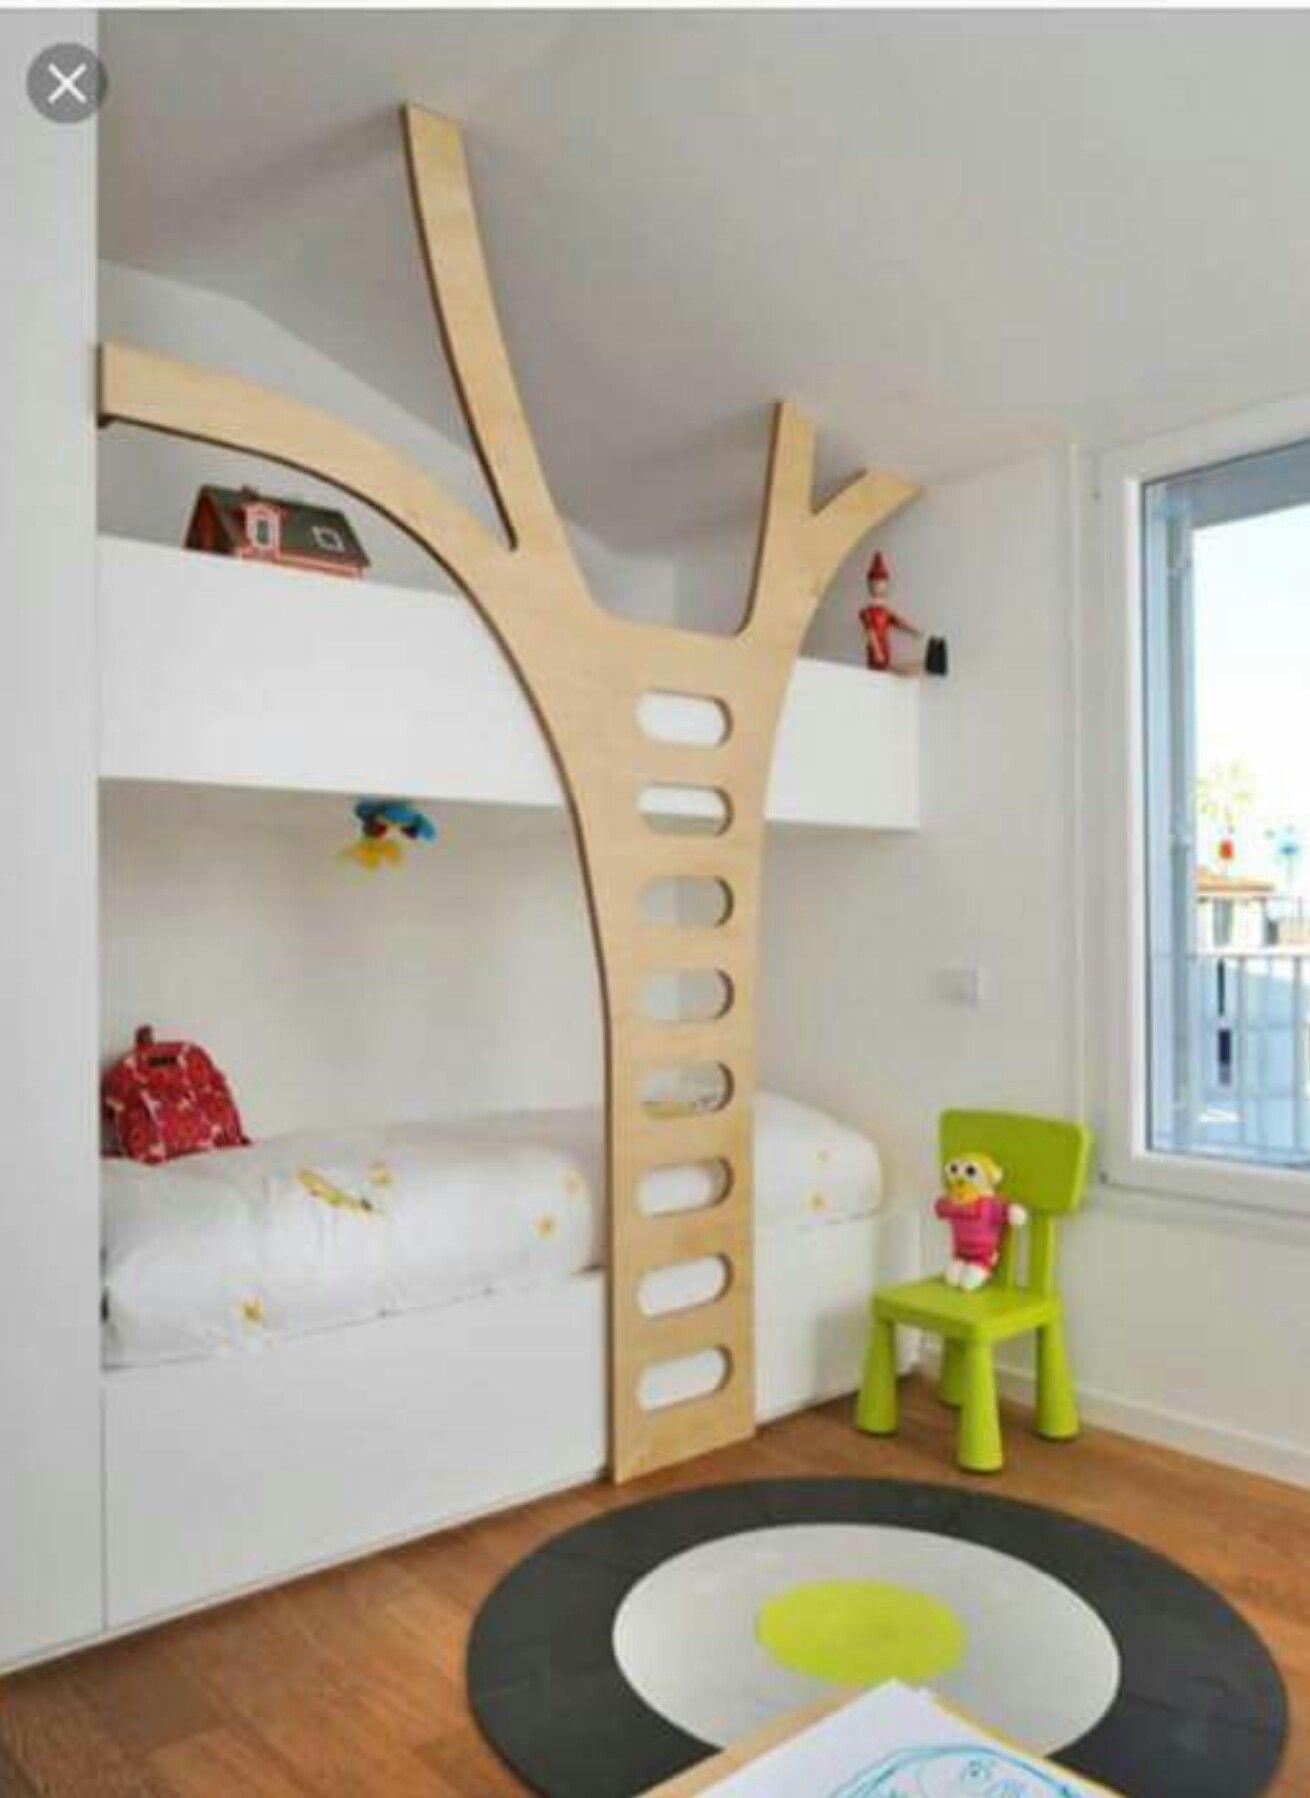 Loft bed railing ideas  Pin by Malxaz Asistishvili on Надо попробовать  Pinterest  Bunk